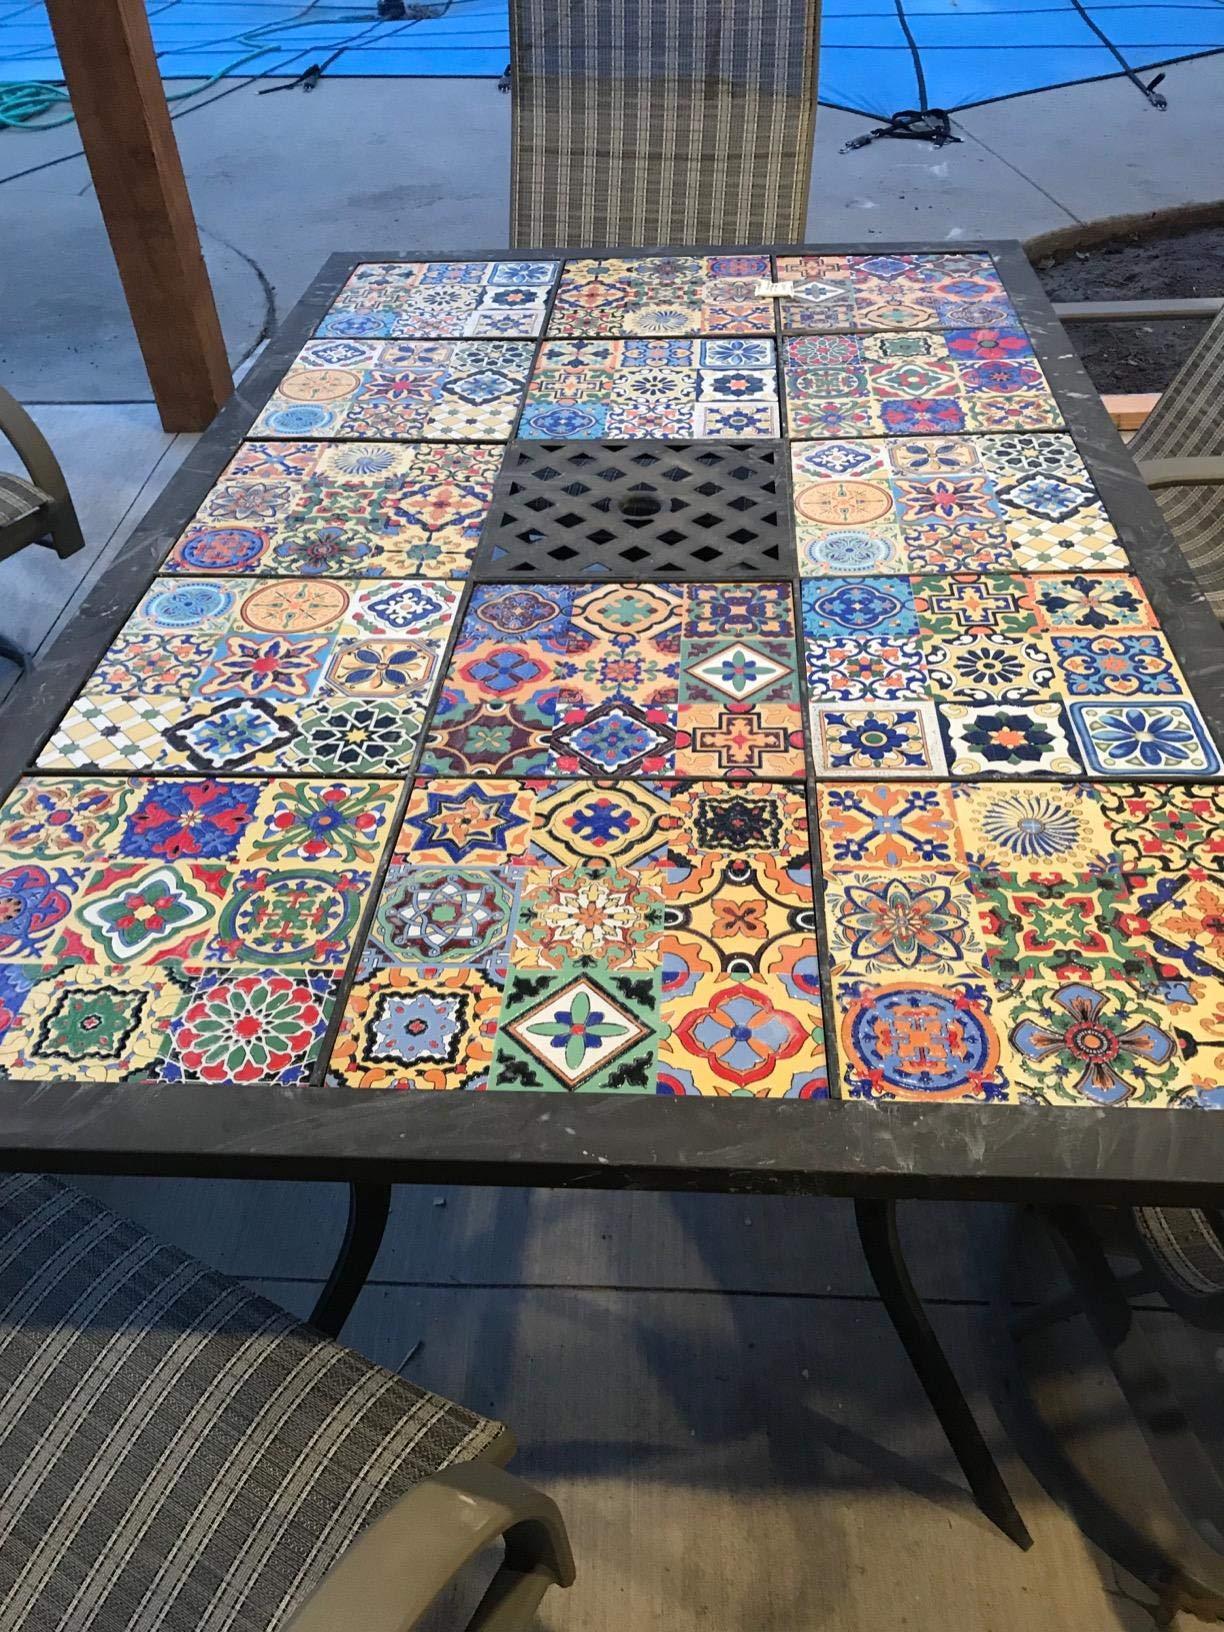 Art3d 6 Sq. Ft Decorative Tiles, Spanish Mediterranean Decor, Hand Painted Talavera Mexican Tiles by Art3d